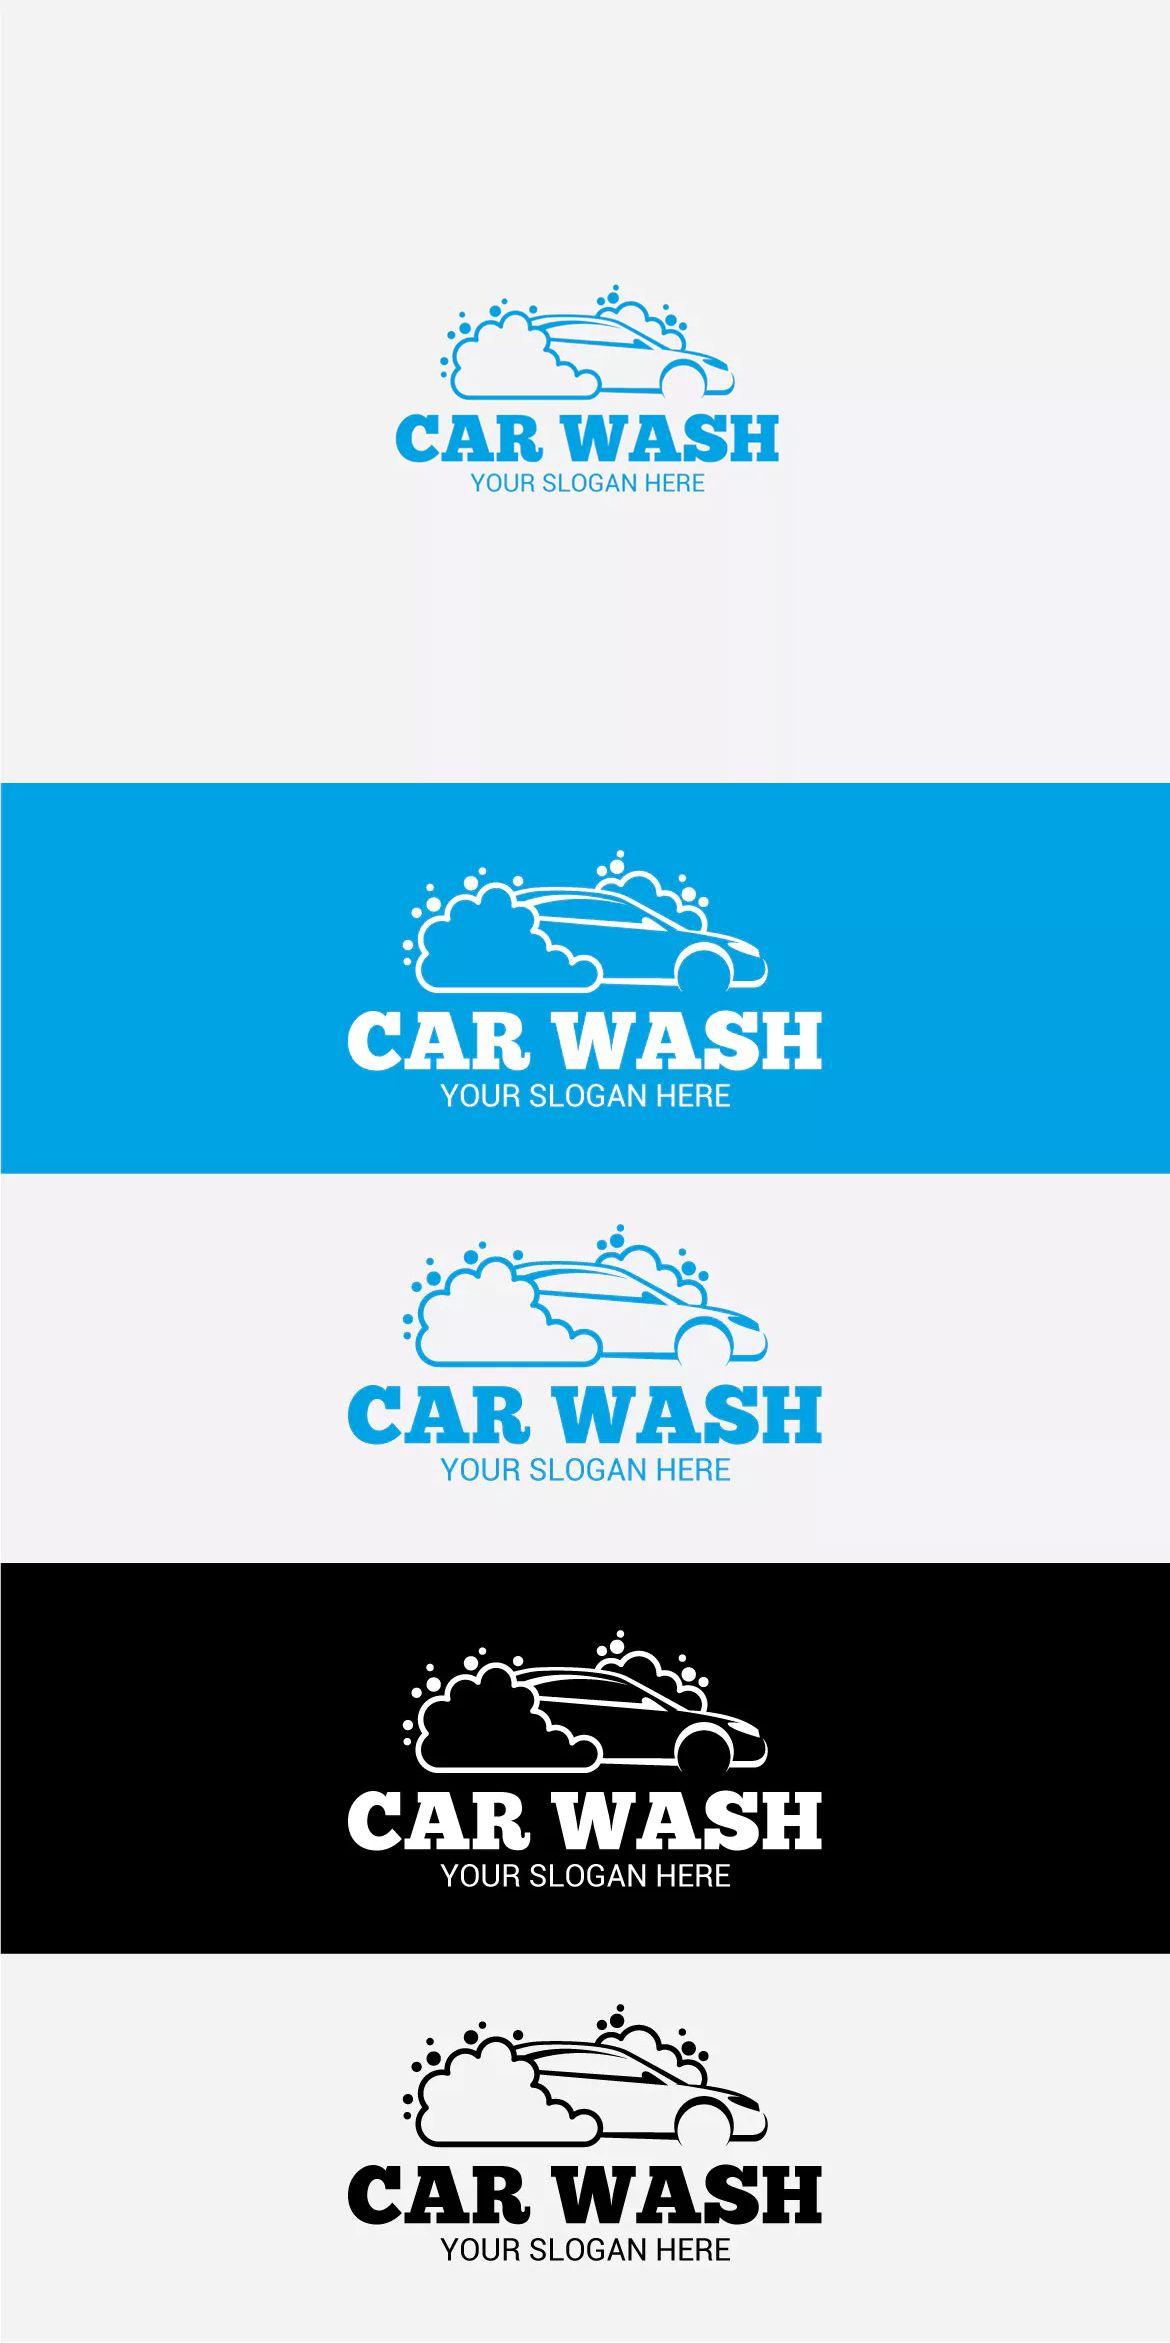 CAR WASH by shazidesigns on Автомойка, Дизайн пекарни и